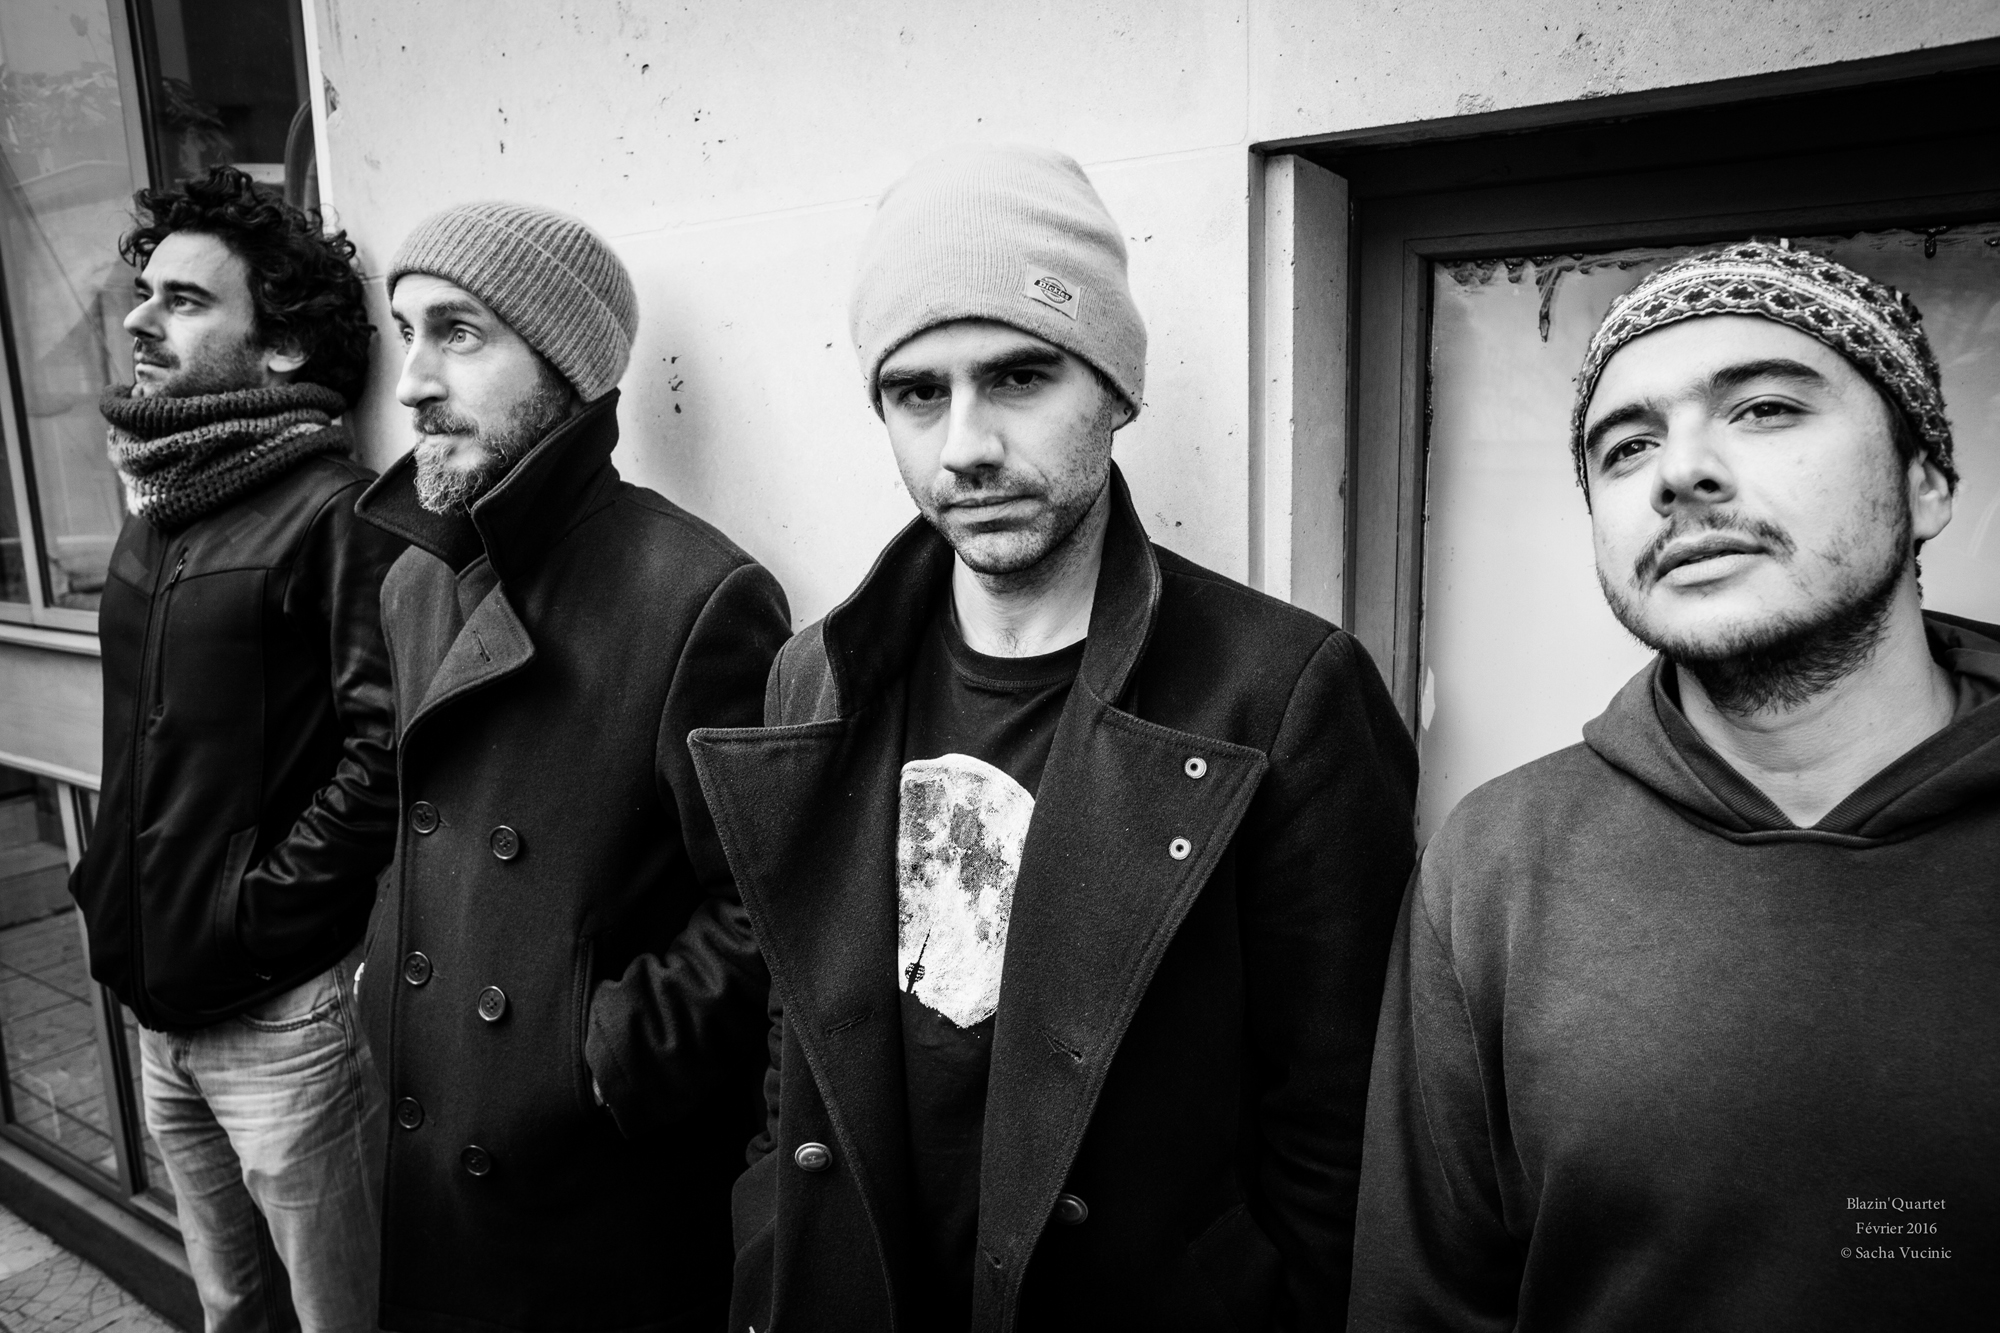 Blazin' Quartet